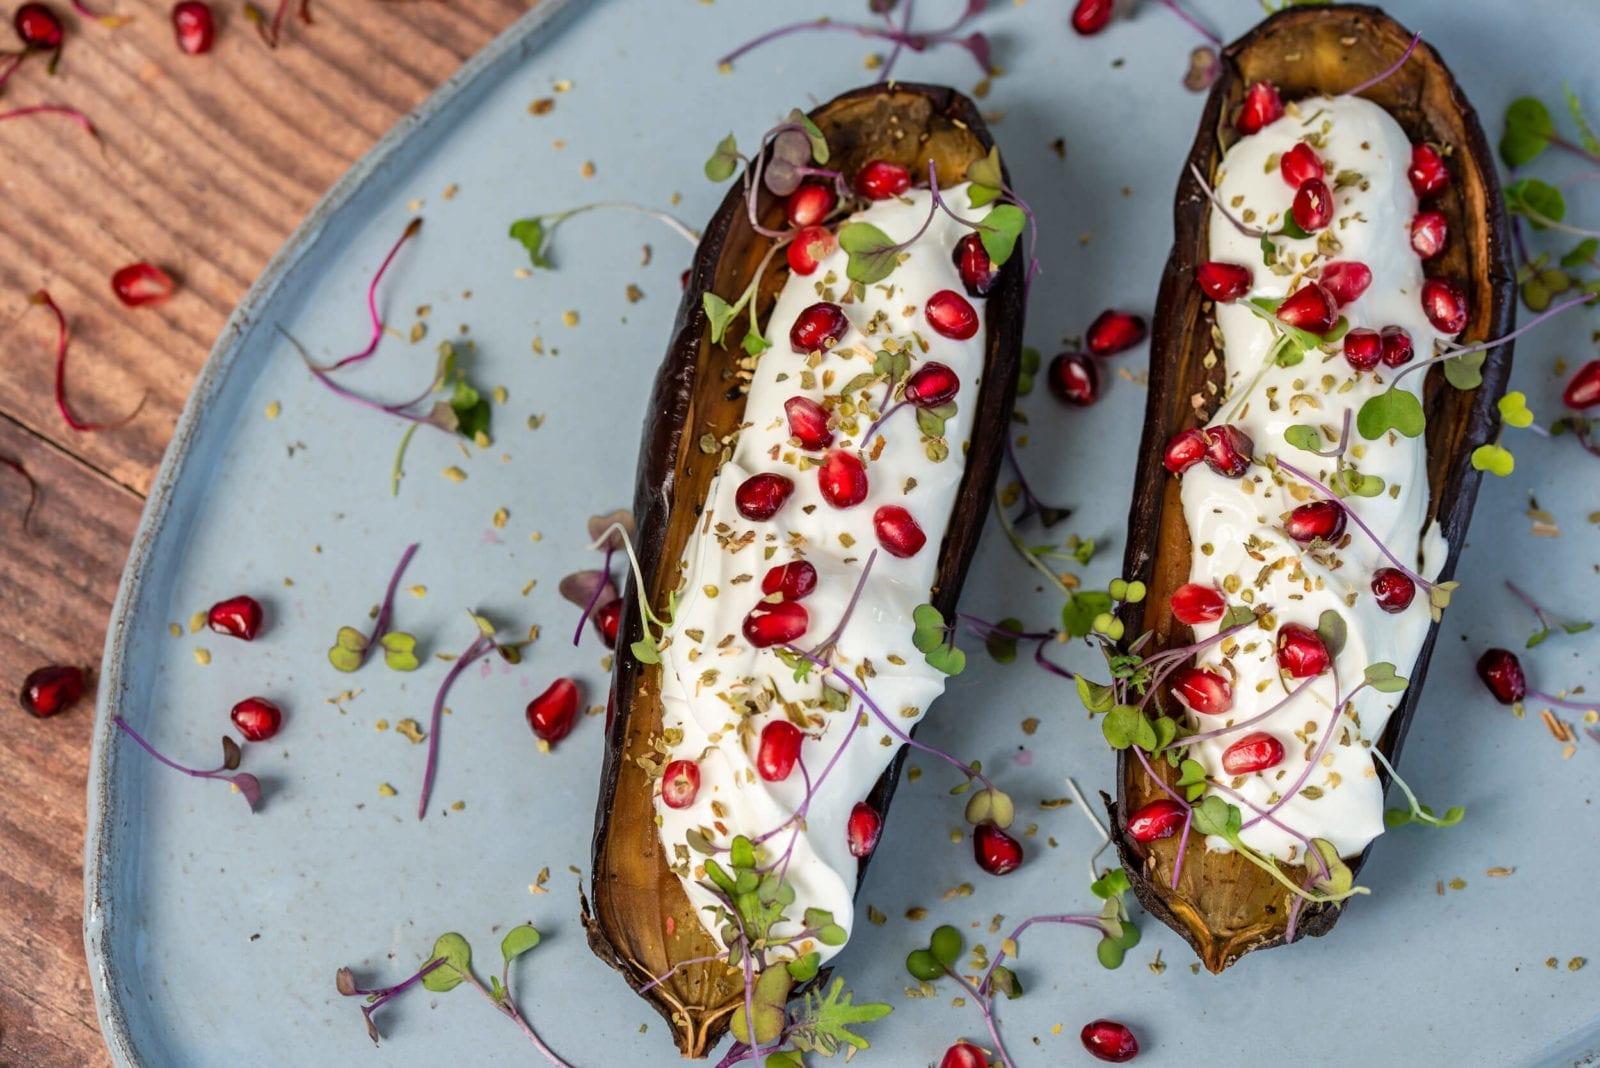 Doya's Eggplant with Strained Yogurt & Pomegranate